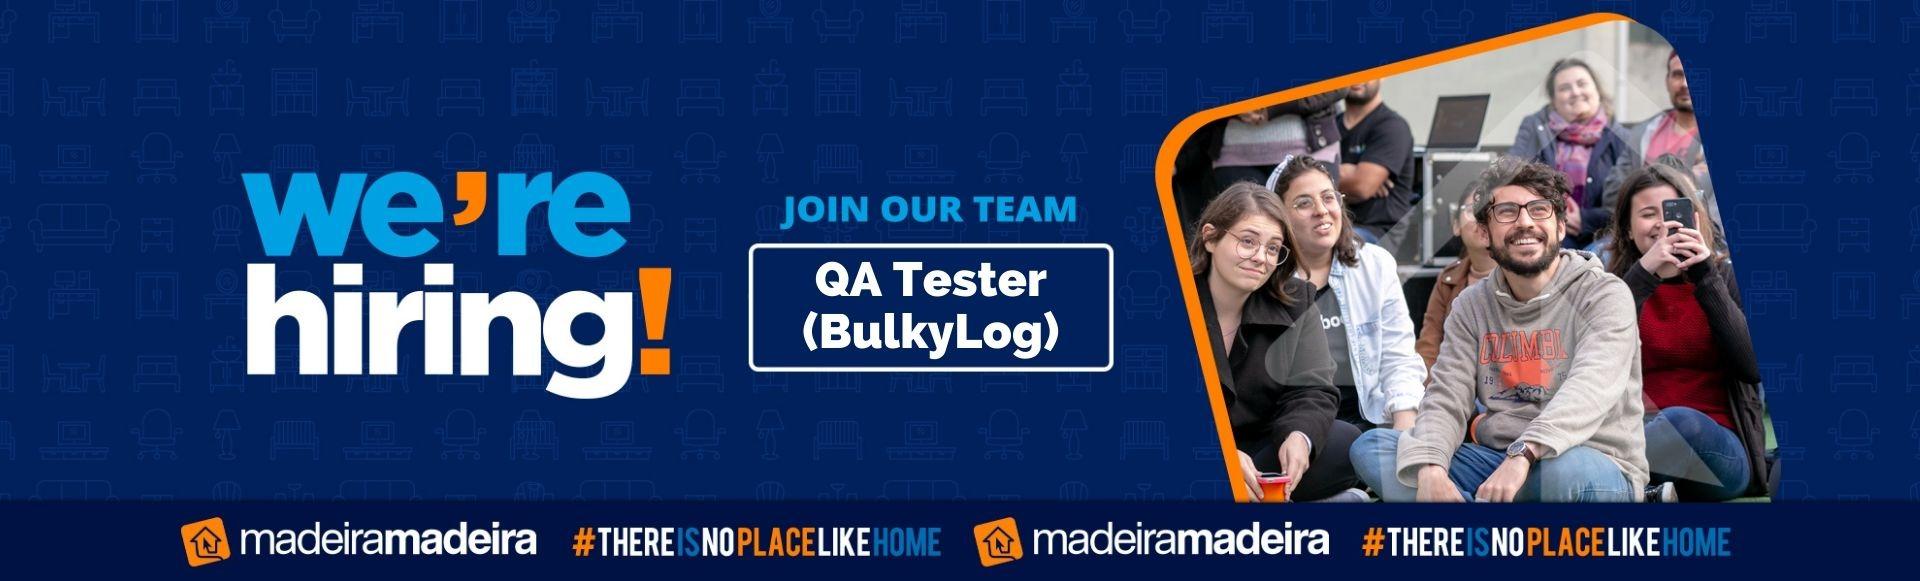 QA Tester (BulkyLog)